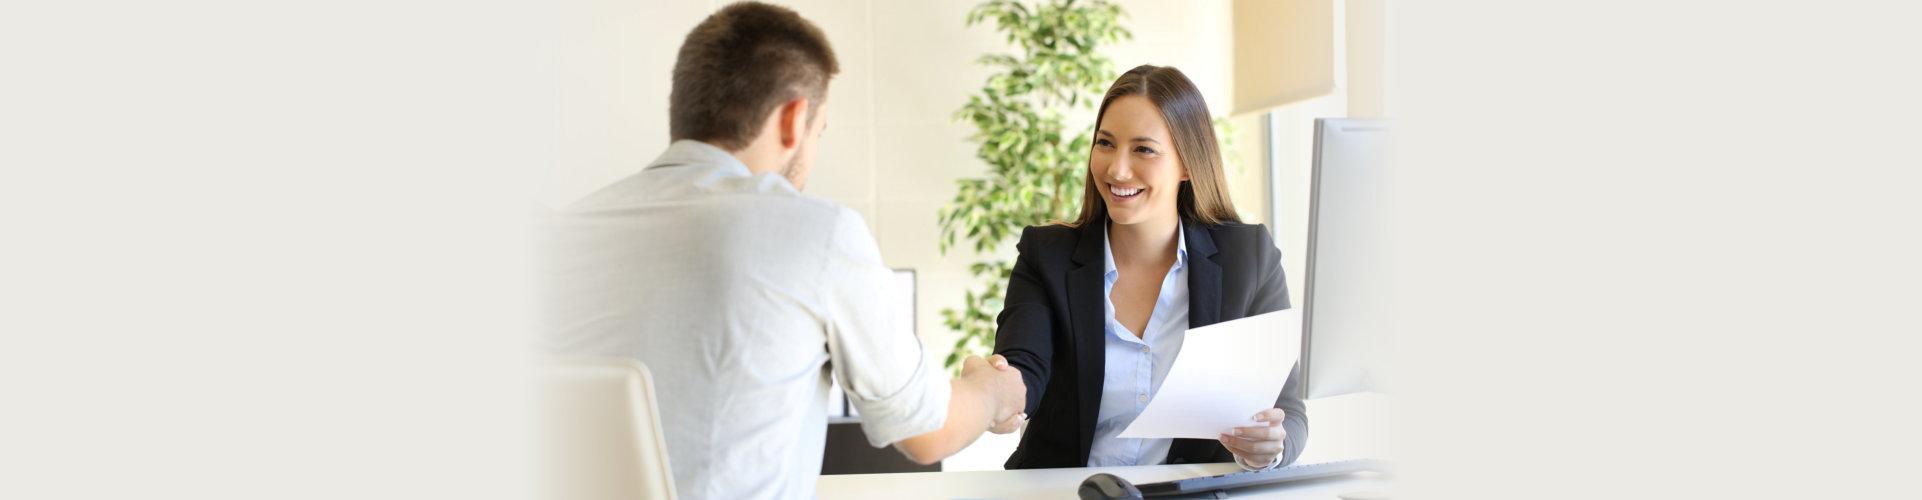 a successful job interview boss employee handshaking